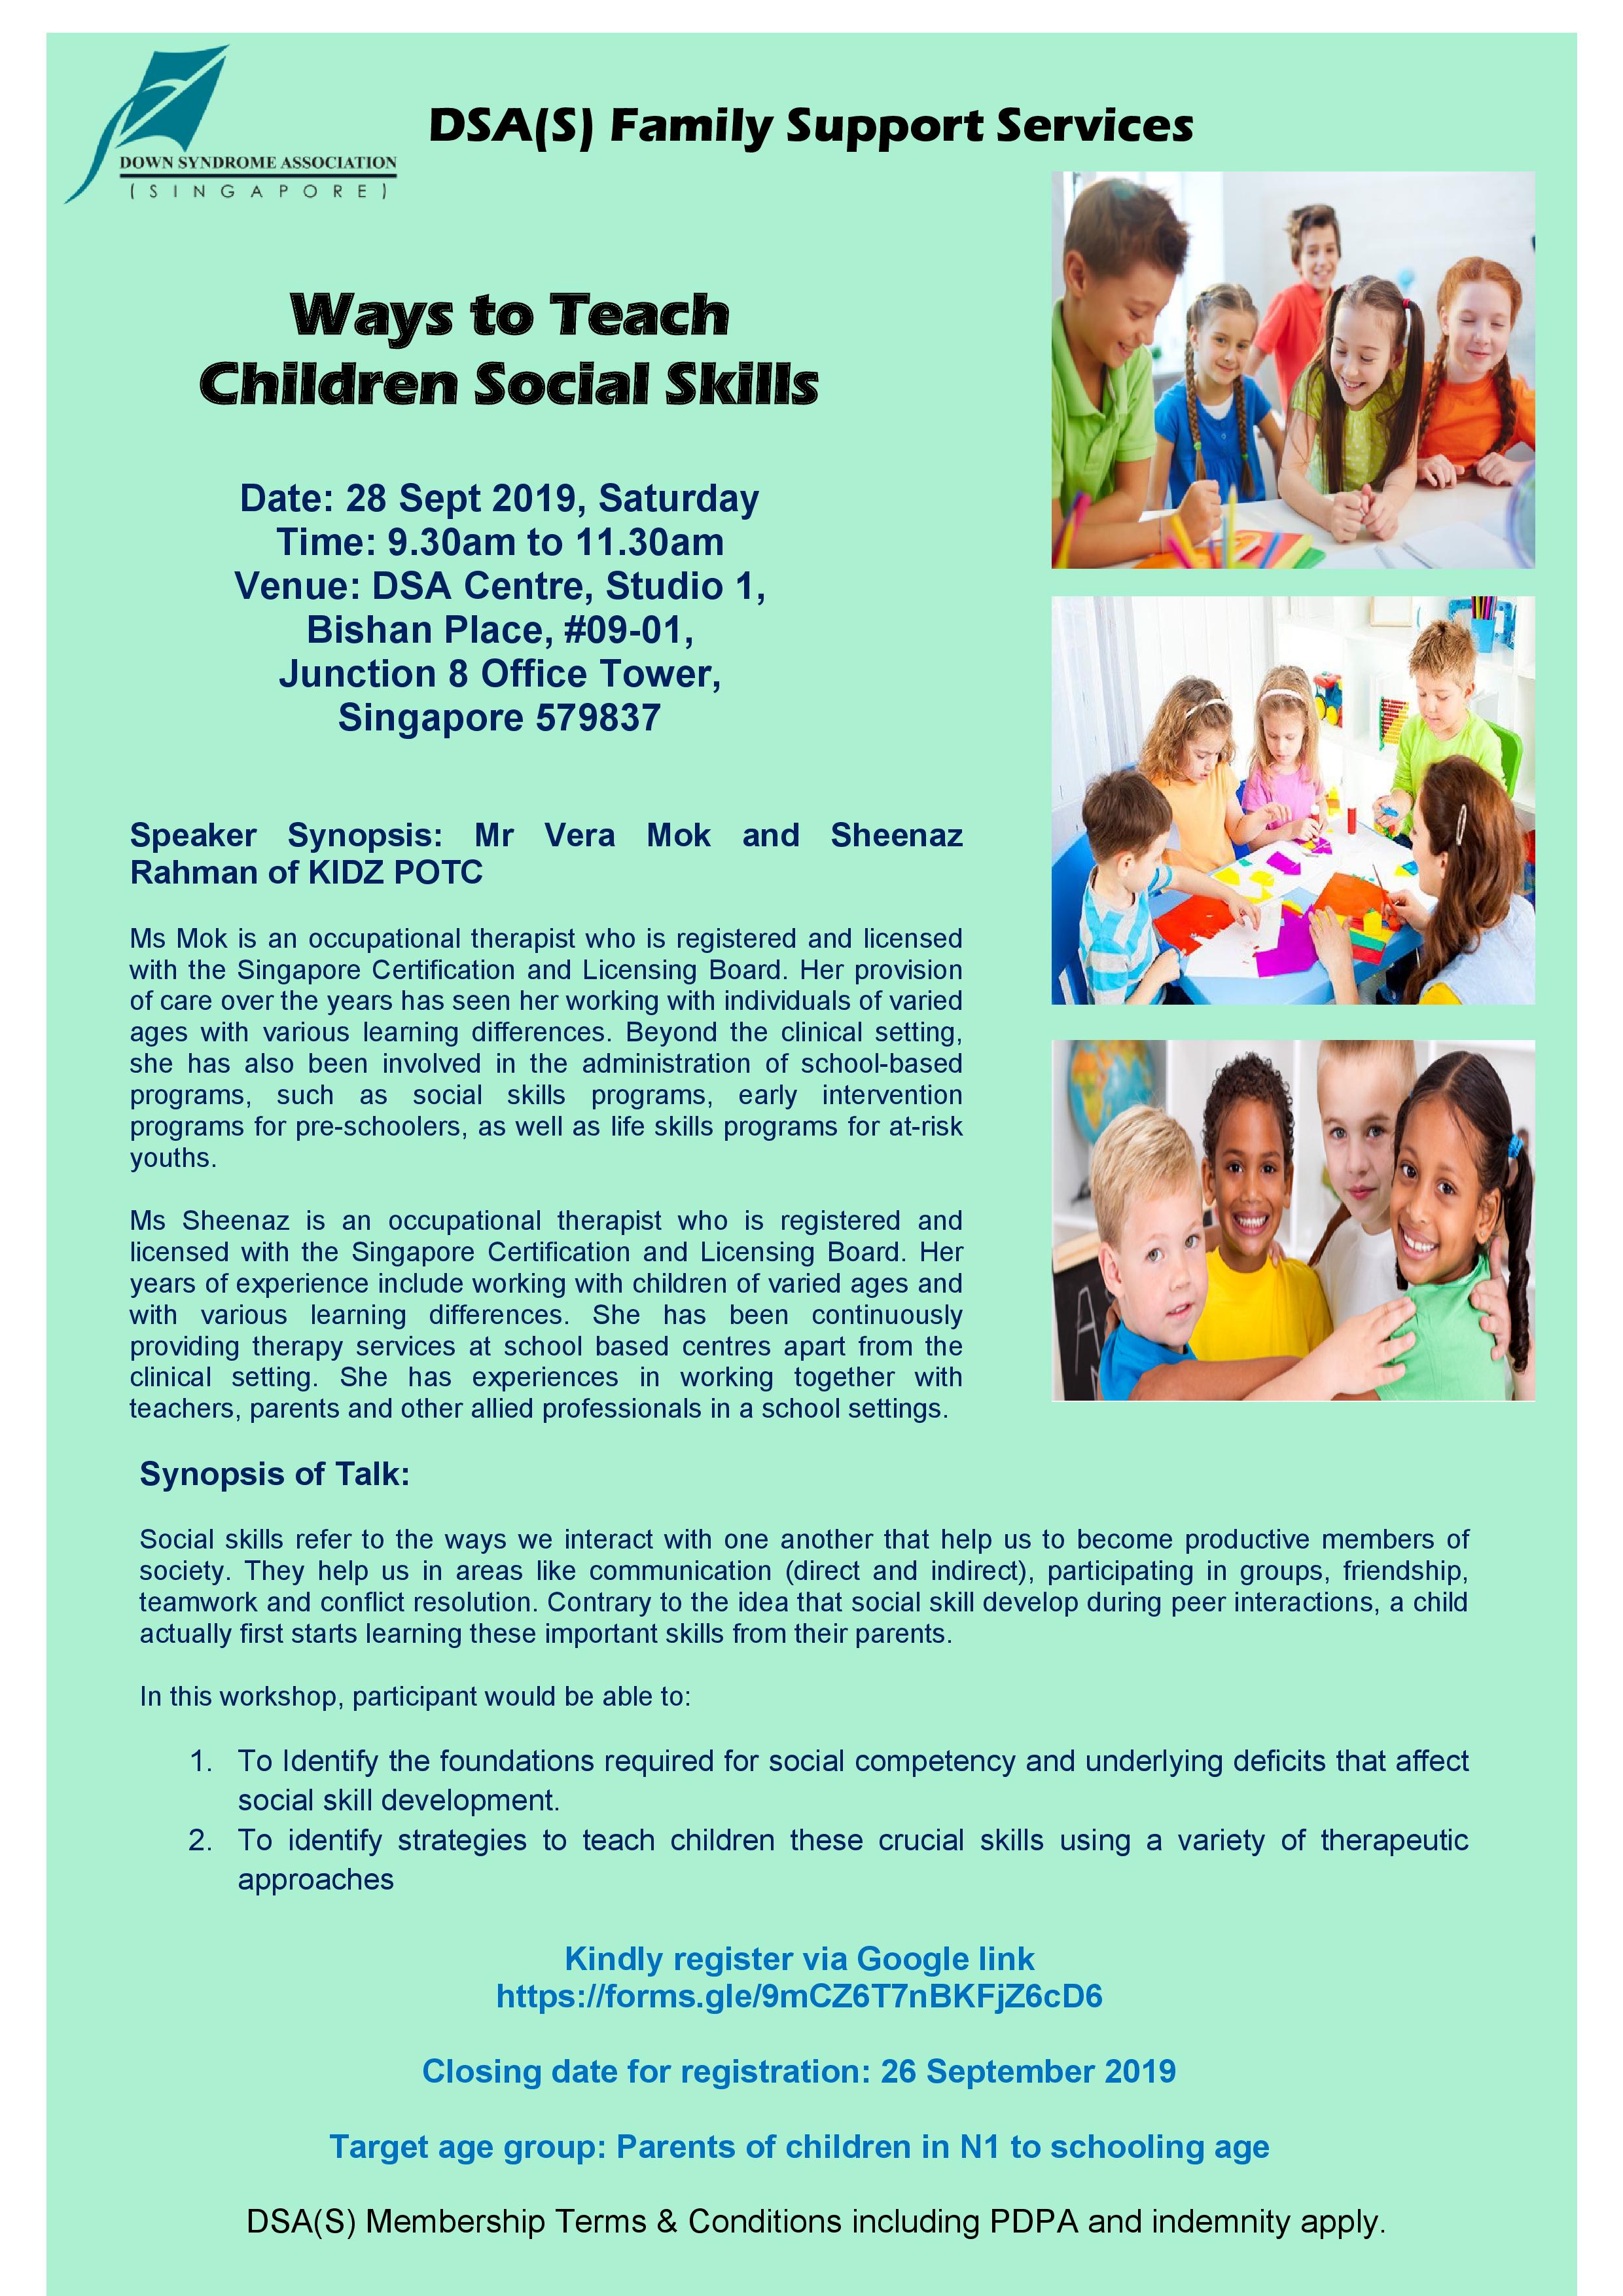 DSA Workshop - Ways To Teach Children Social Skills